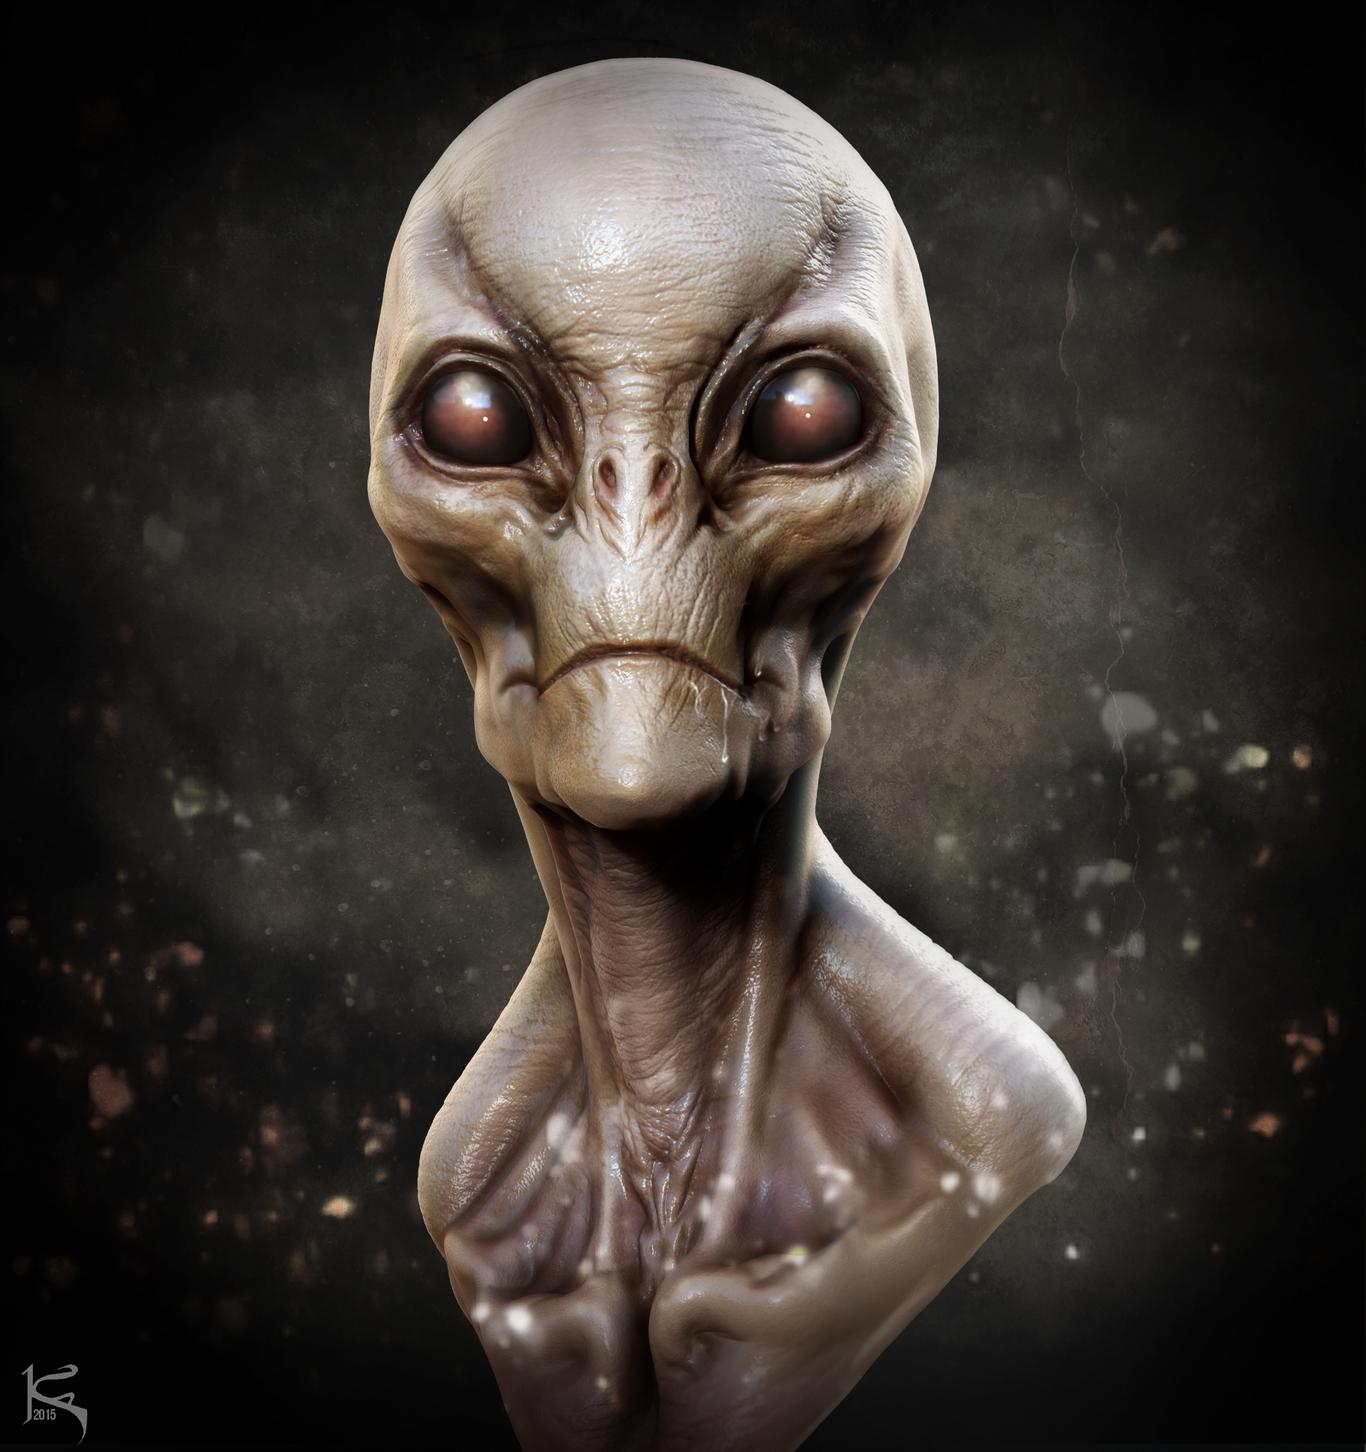 Aris Kolokontes Fan Art #2 - Alien Creature Design Doodle